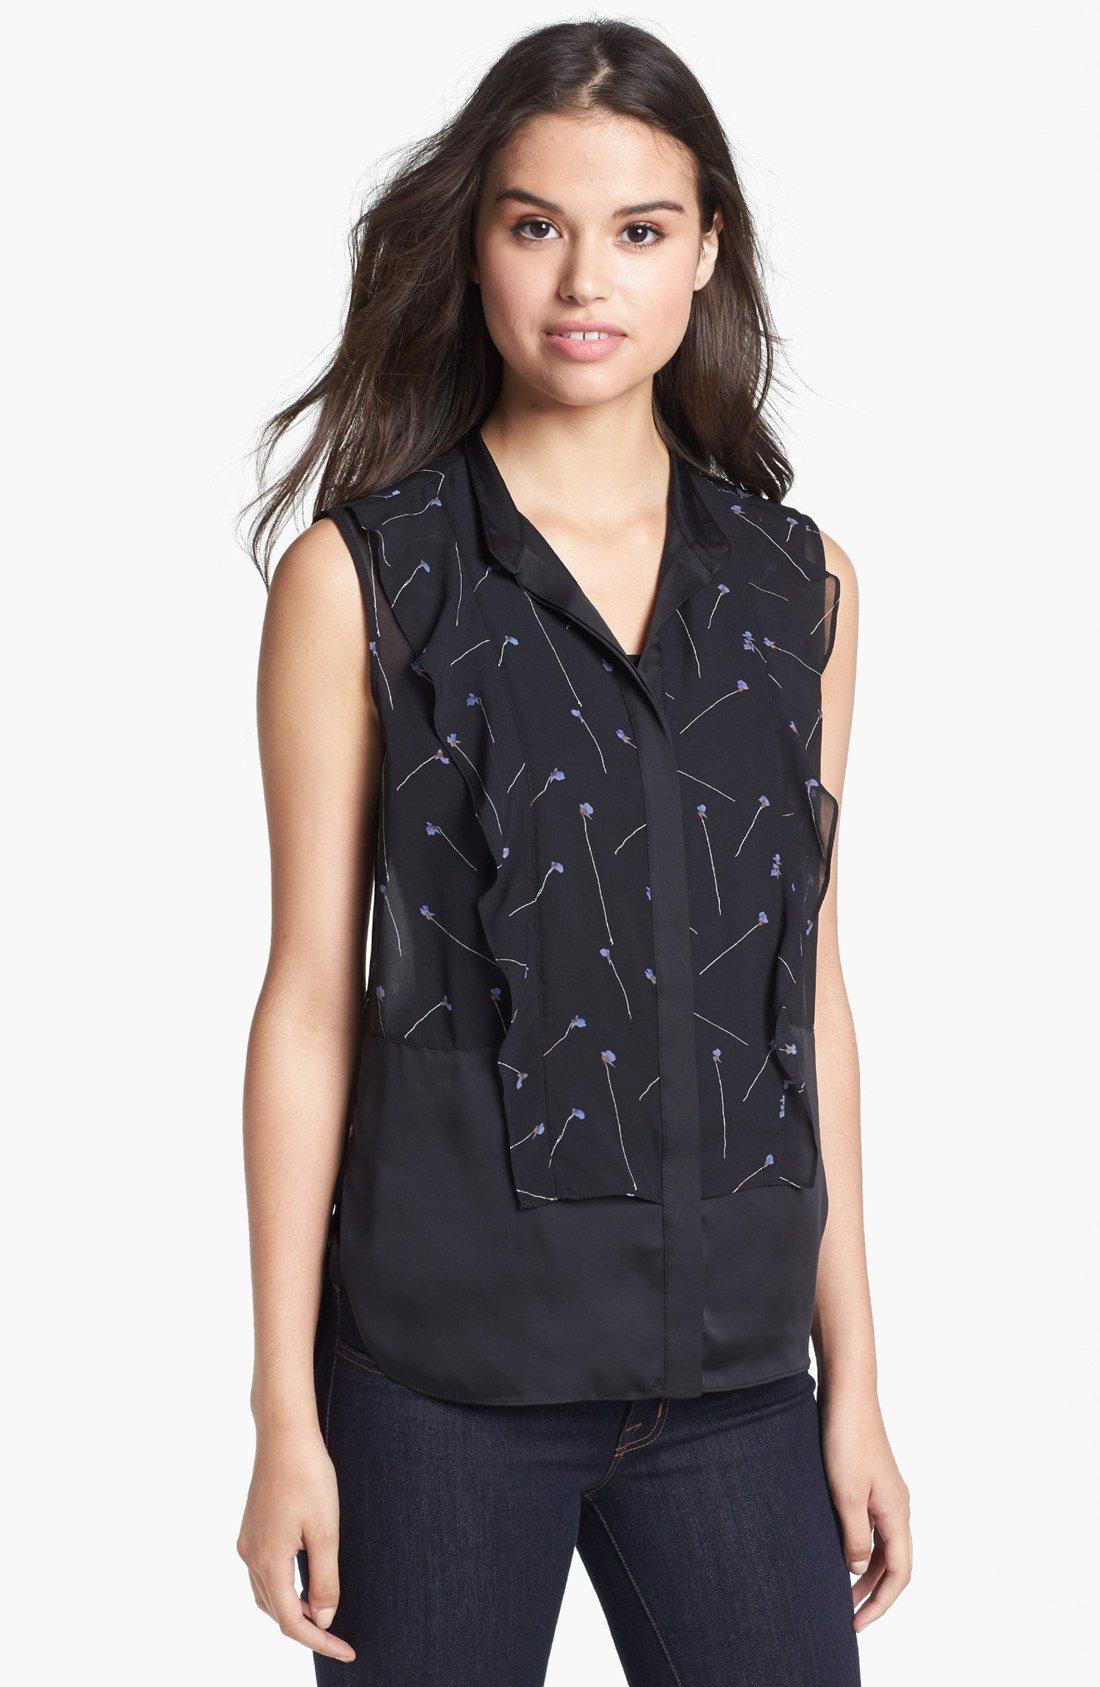 Tailored Shirt - Black Oxford Womens Ruffle Shirt by